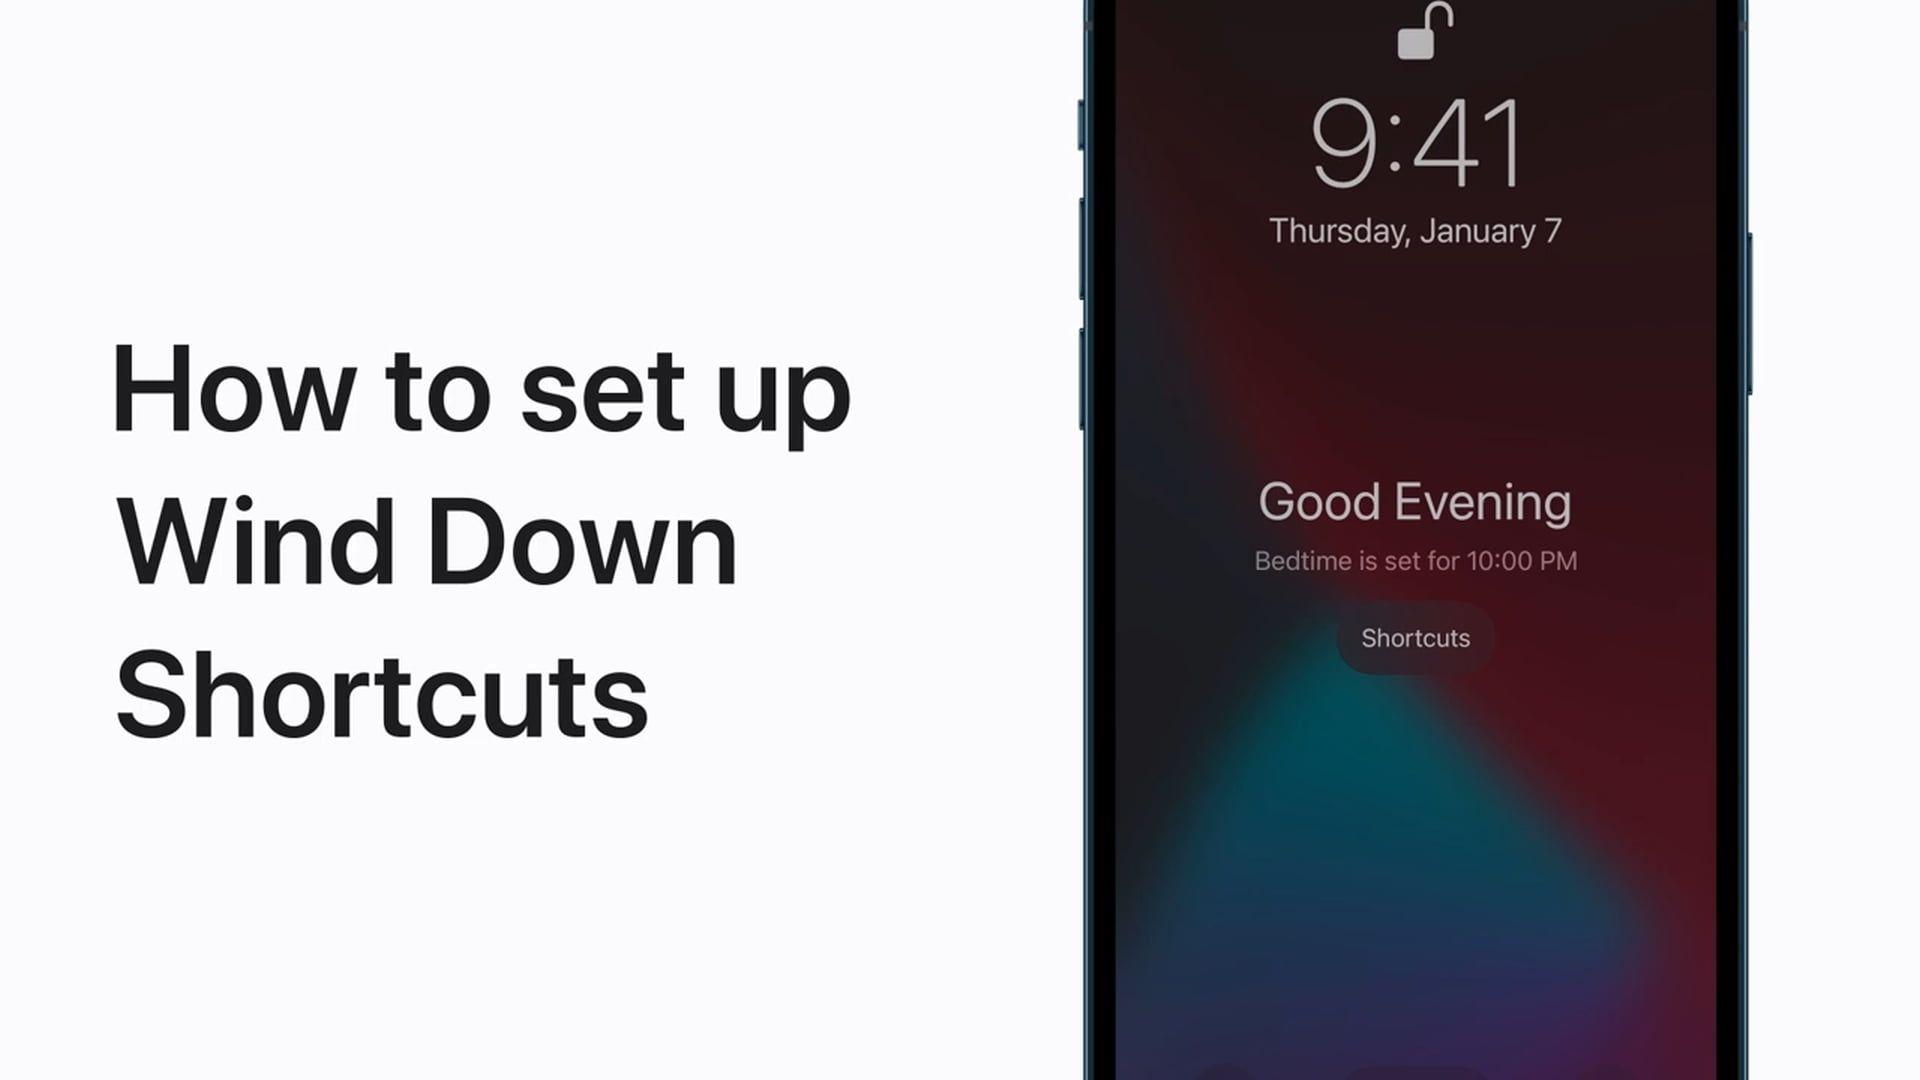 Poradnik Apple: Nowe poradniki na temat systemu iOS